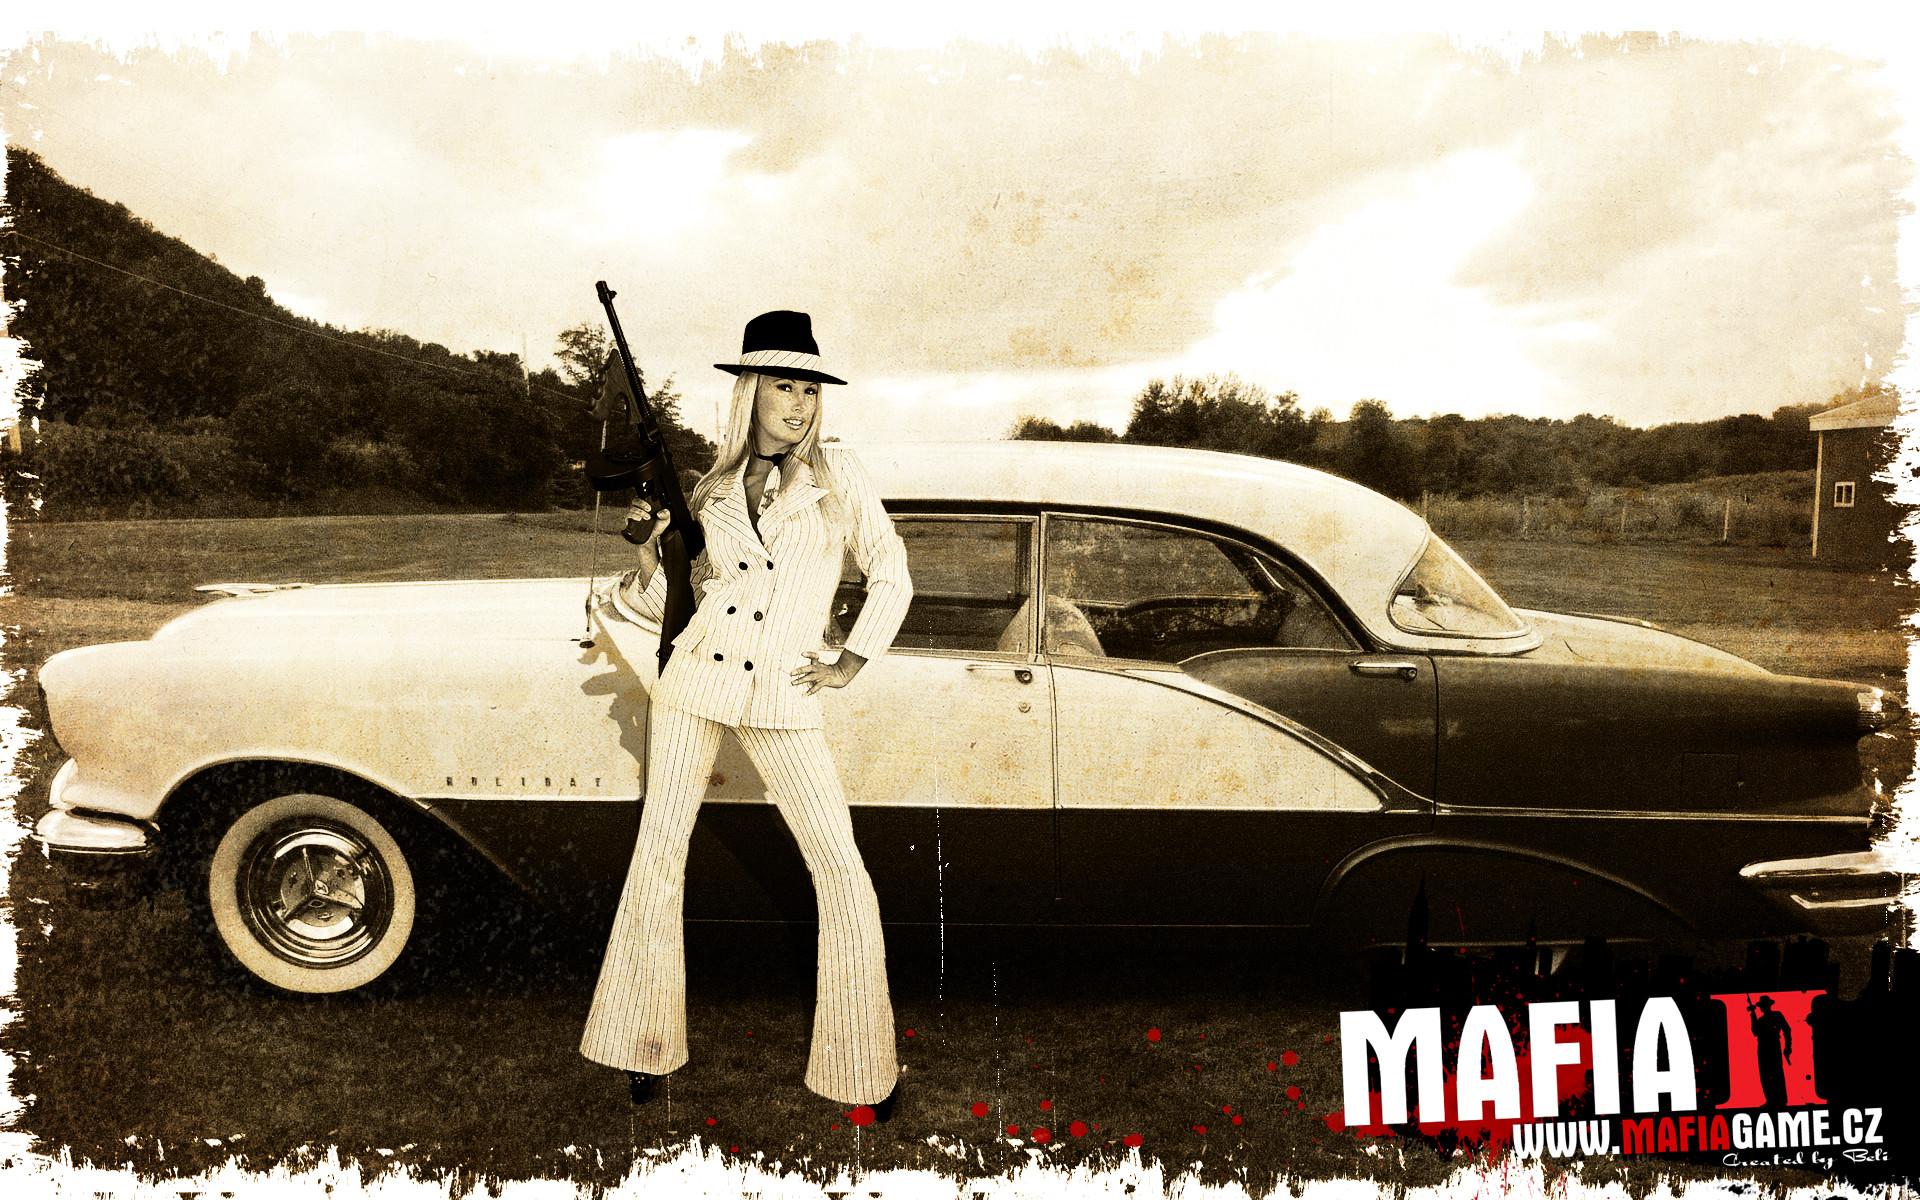 Mobster Wallpaper Hd Mafia wallpapers – full hd